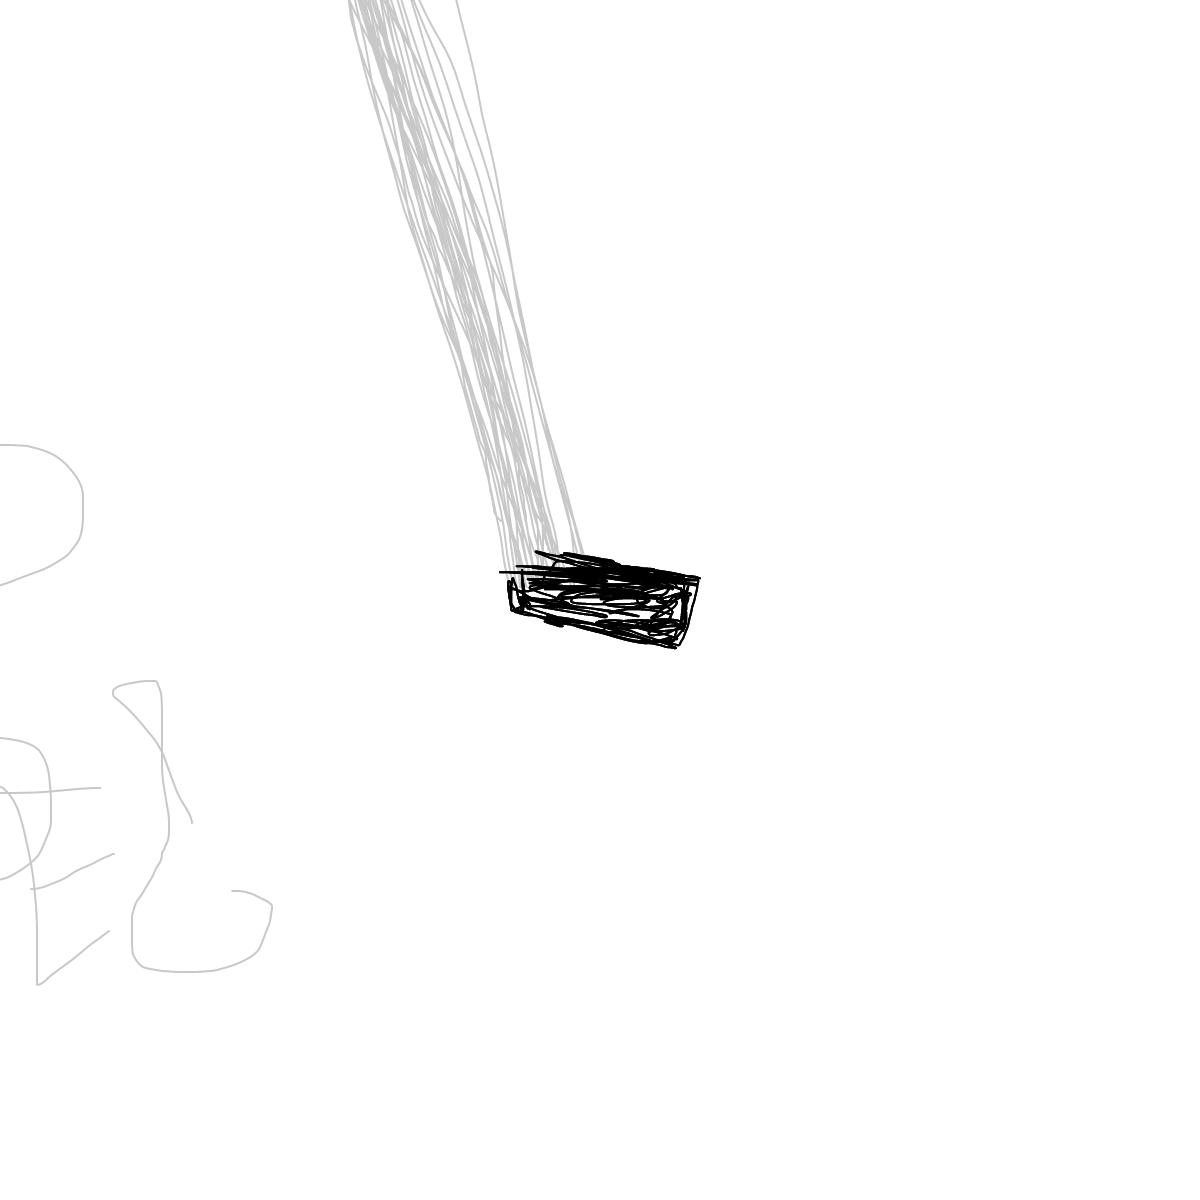 BAAAM drawing#11591 lat:52.4750823974609400lng: 13.4079351425170900